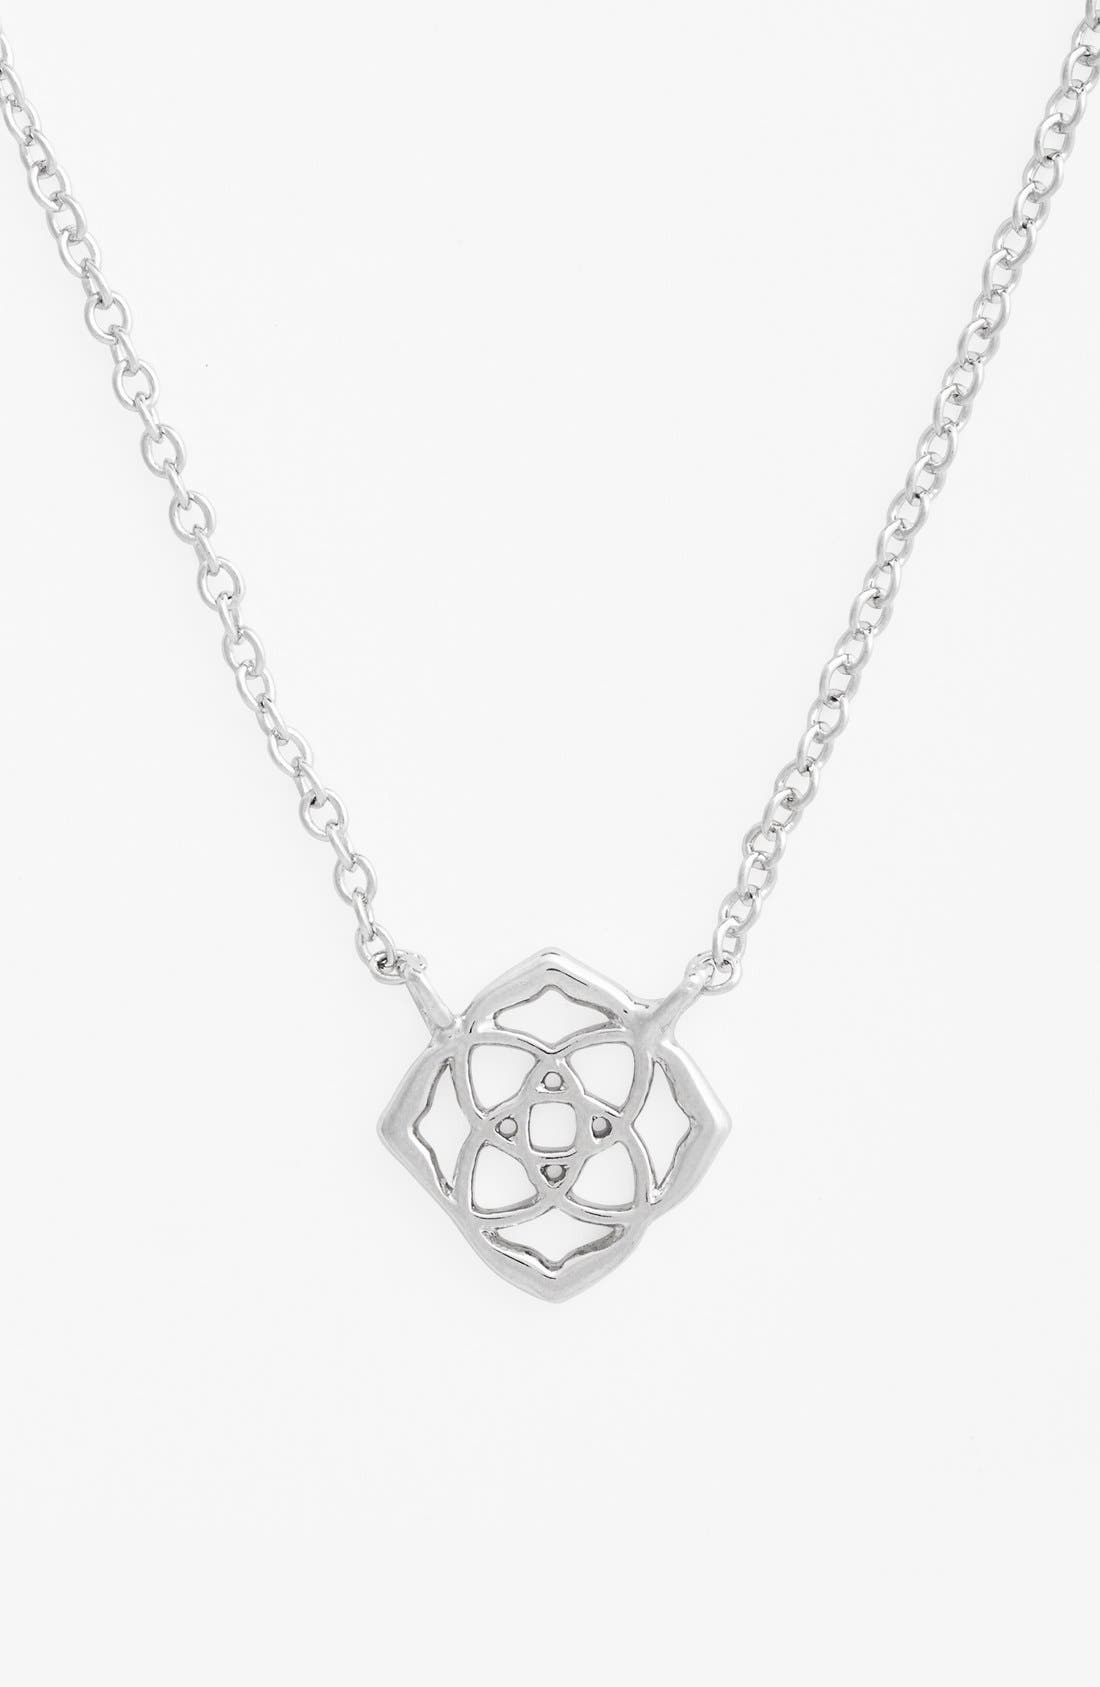 Alternate Image 1 Selected - Kendra Scott 'Decklyn' Pendant Necklace